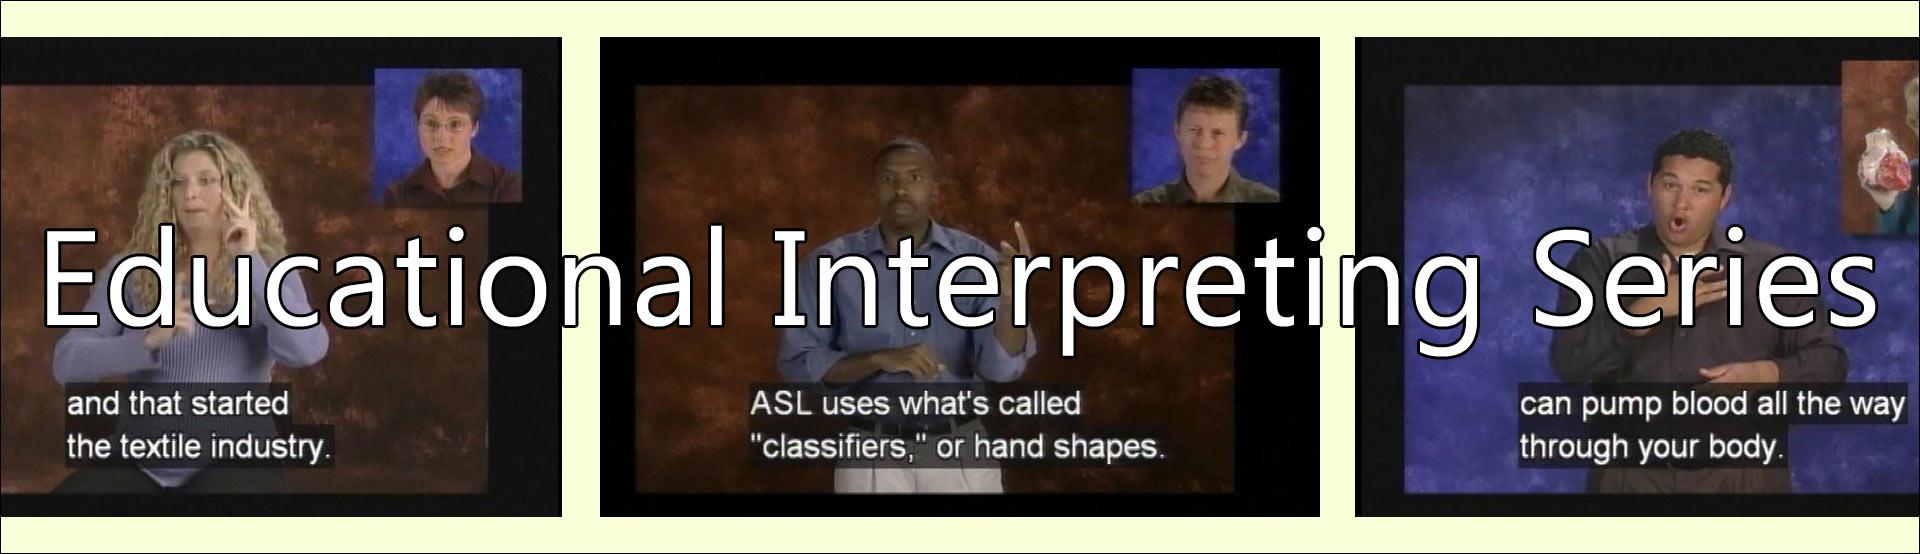 Educational Interpreting Series